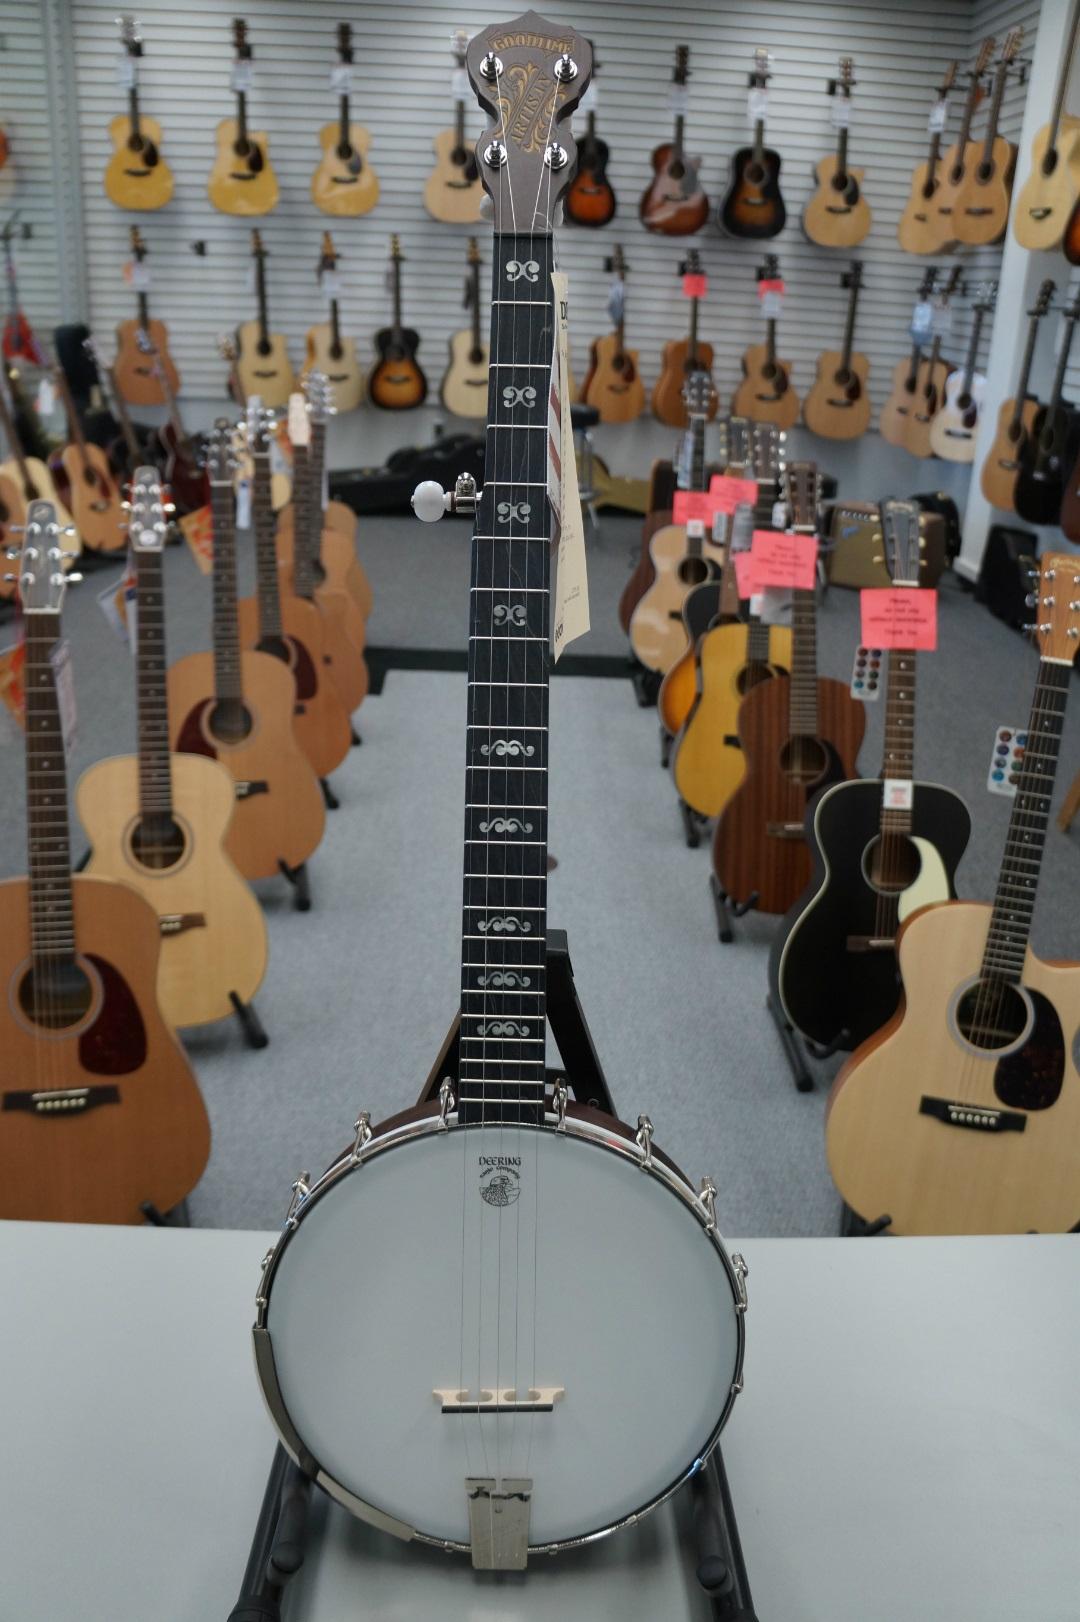 Deering Artisan Goodtime Open back Banjo